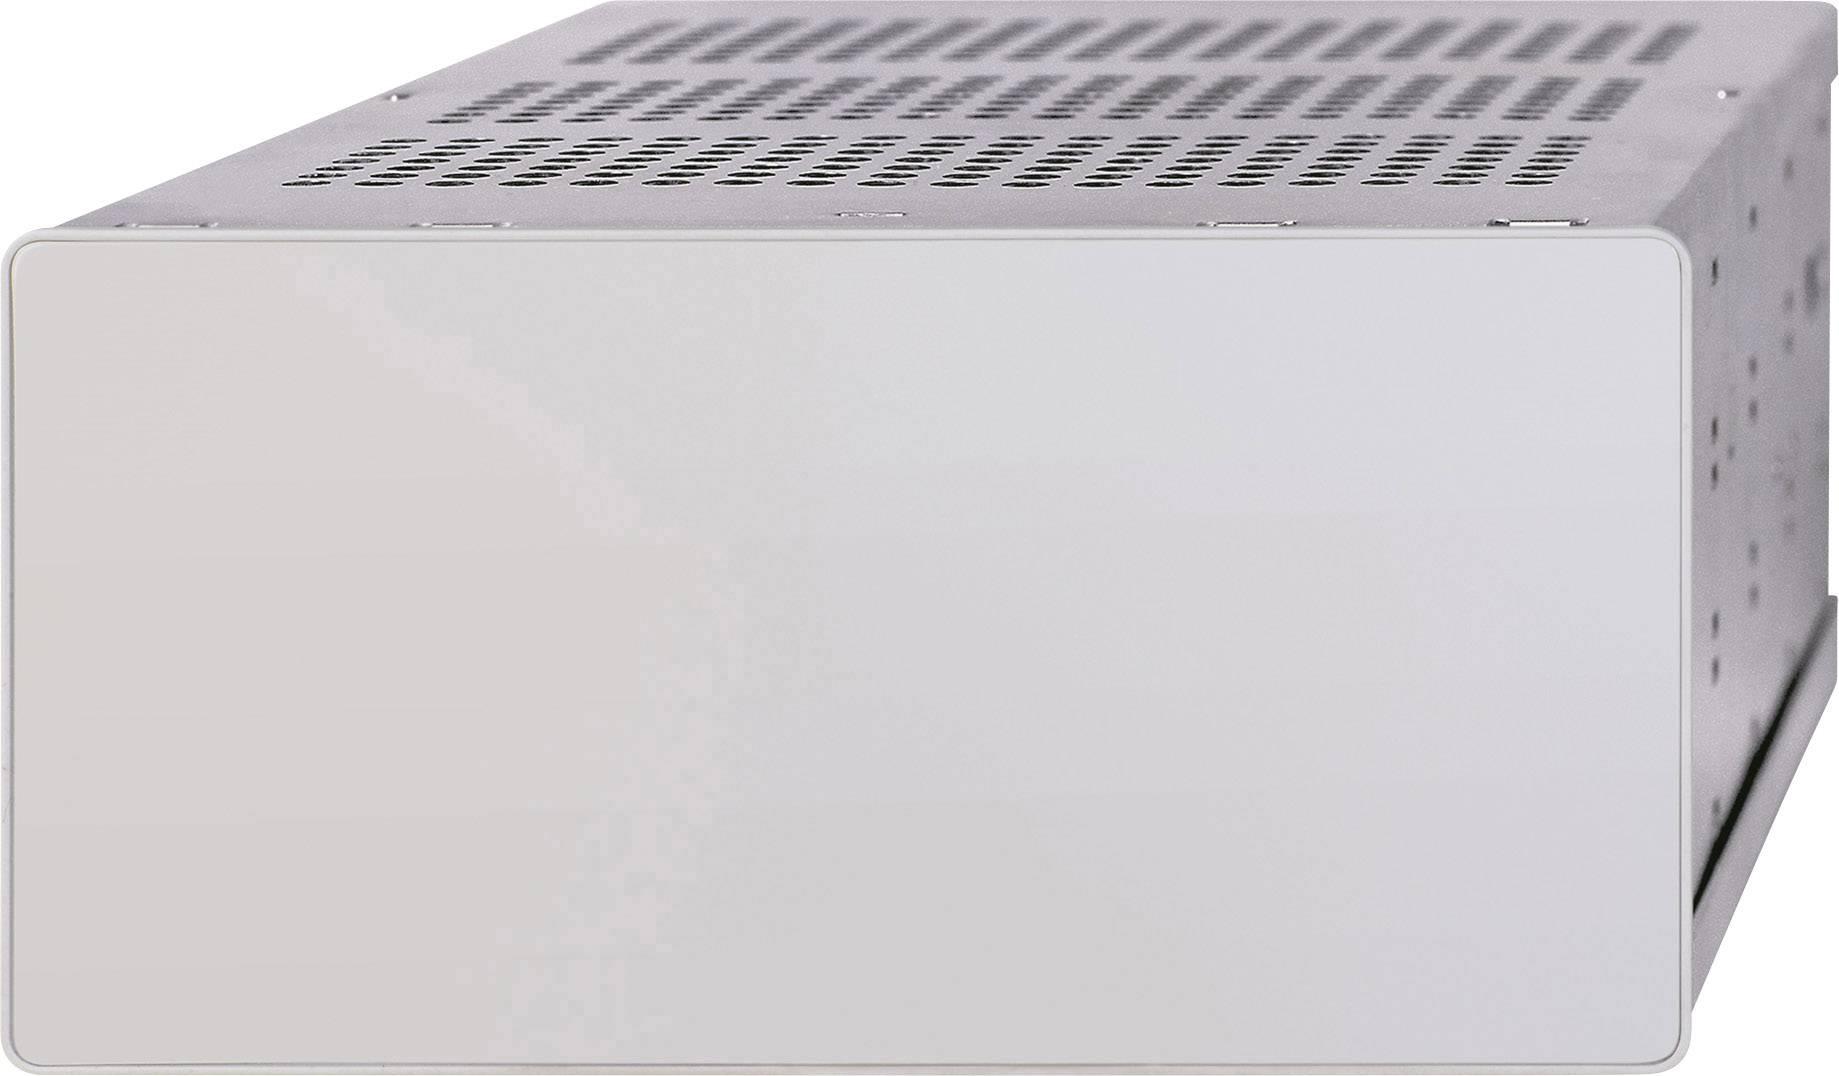 Prázdný modul Rohde & Schwarz Hameg HM 800